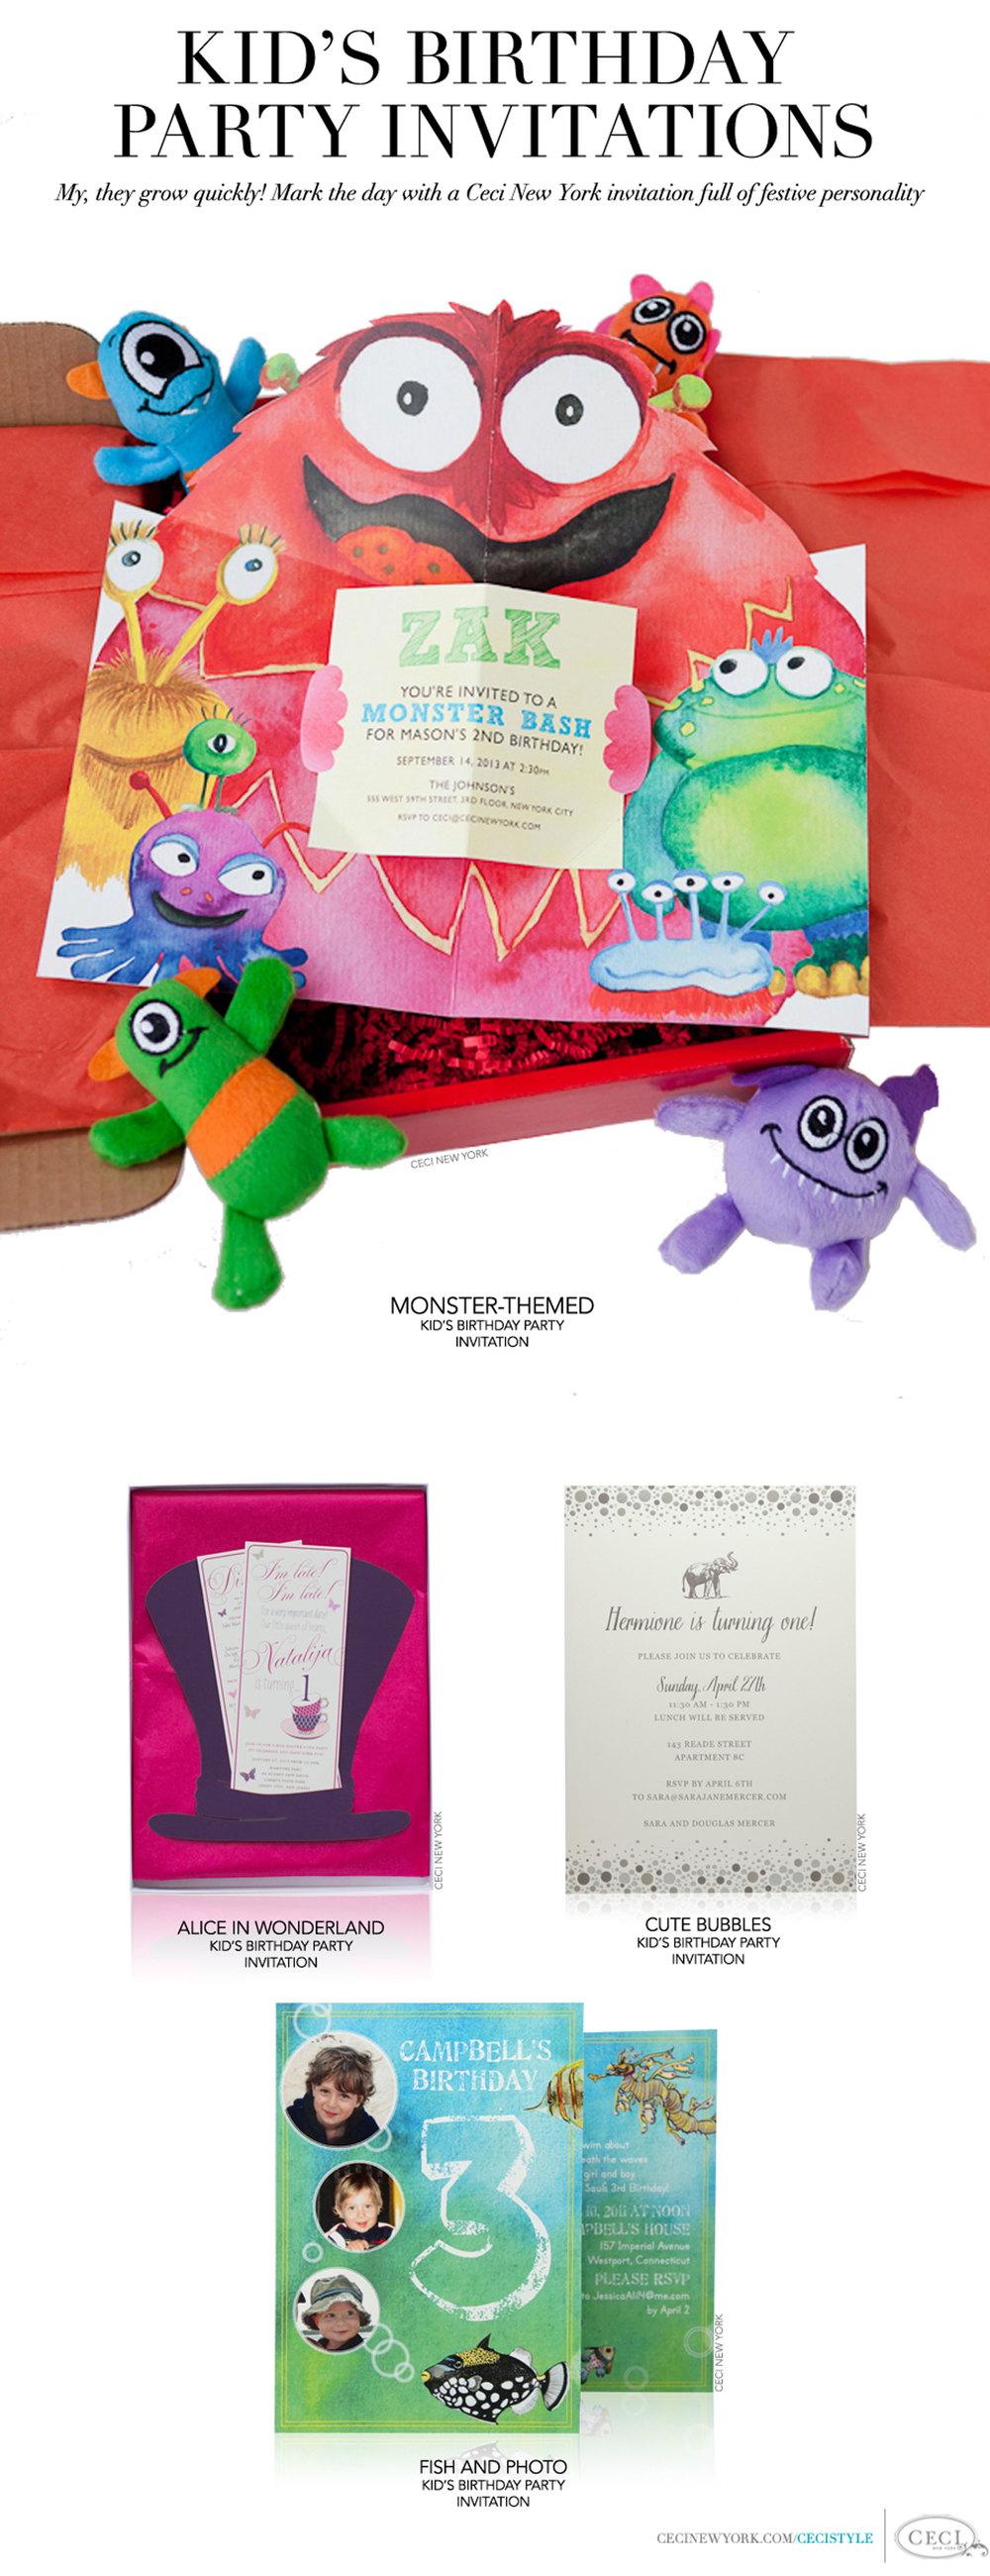 celebration_luxury_kid_birthday_party_invitation_monster_watercolor_bubbles_alice_wonderland_fish_photo_v200_om_2.jpg